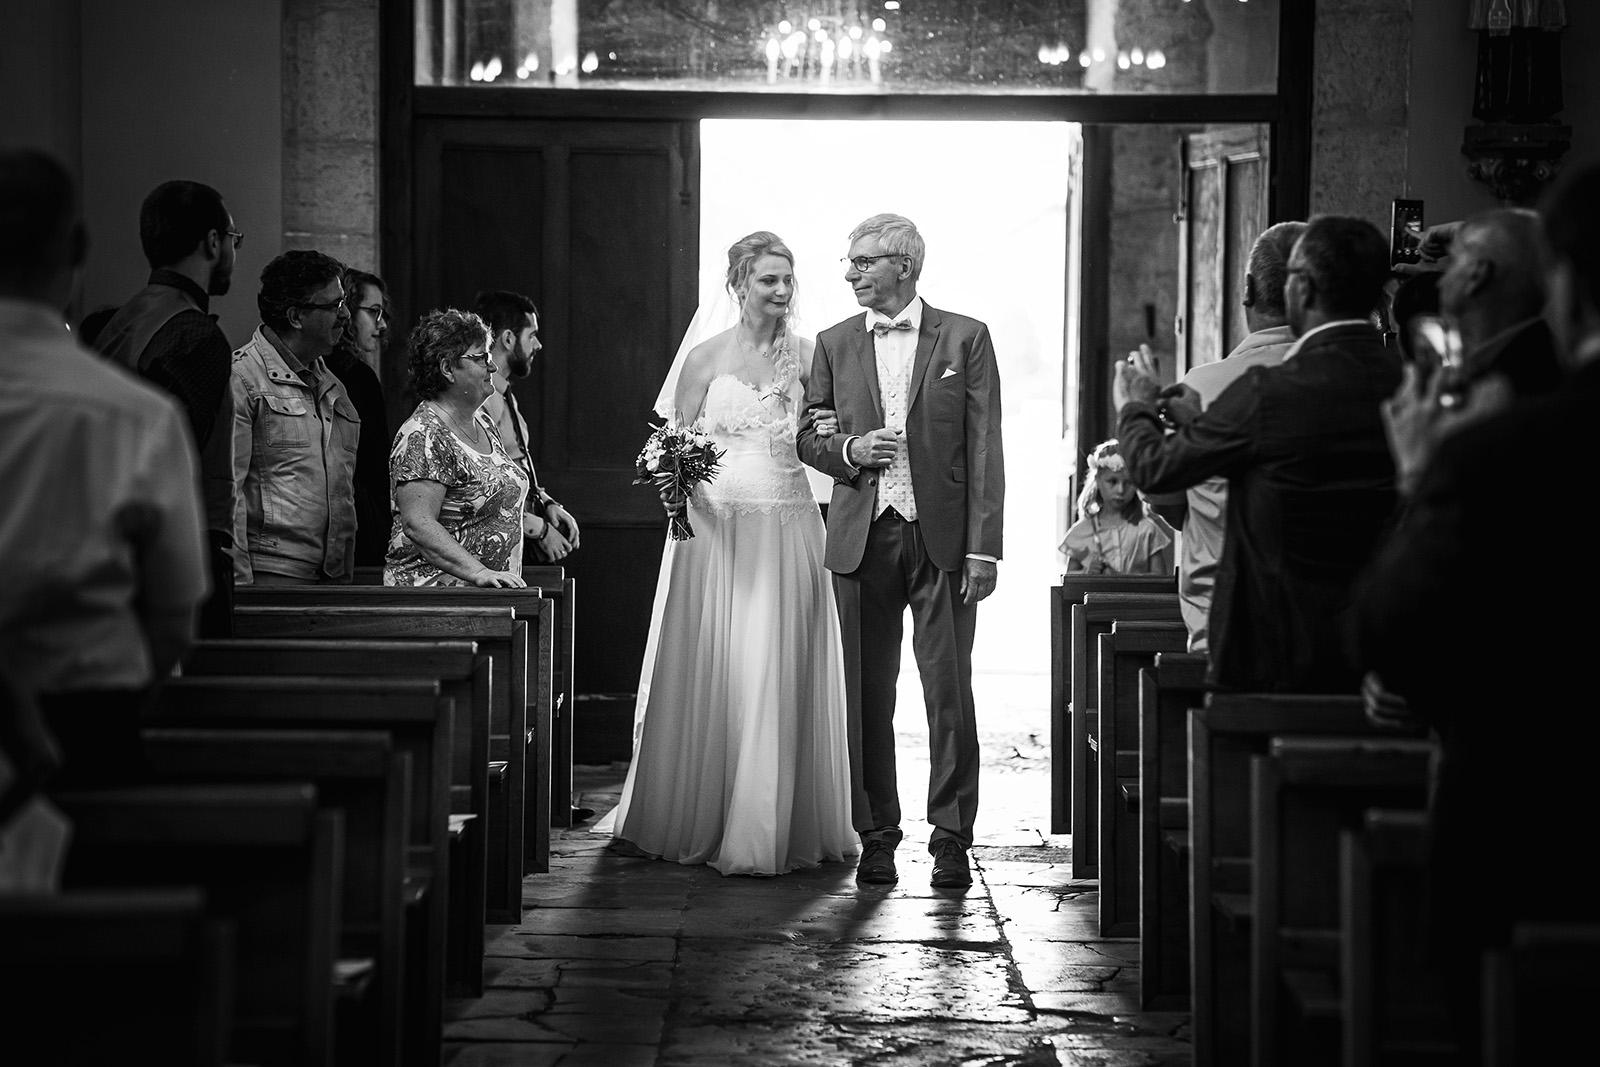 photographe-mariage-wedding-photographer-reportage-photo-domaine-des-plagnes-couple-elise-julliard-auvergne-rhone-alpes-bourgoin-jallieu-ceremonie-religieuse-2